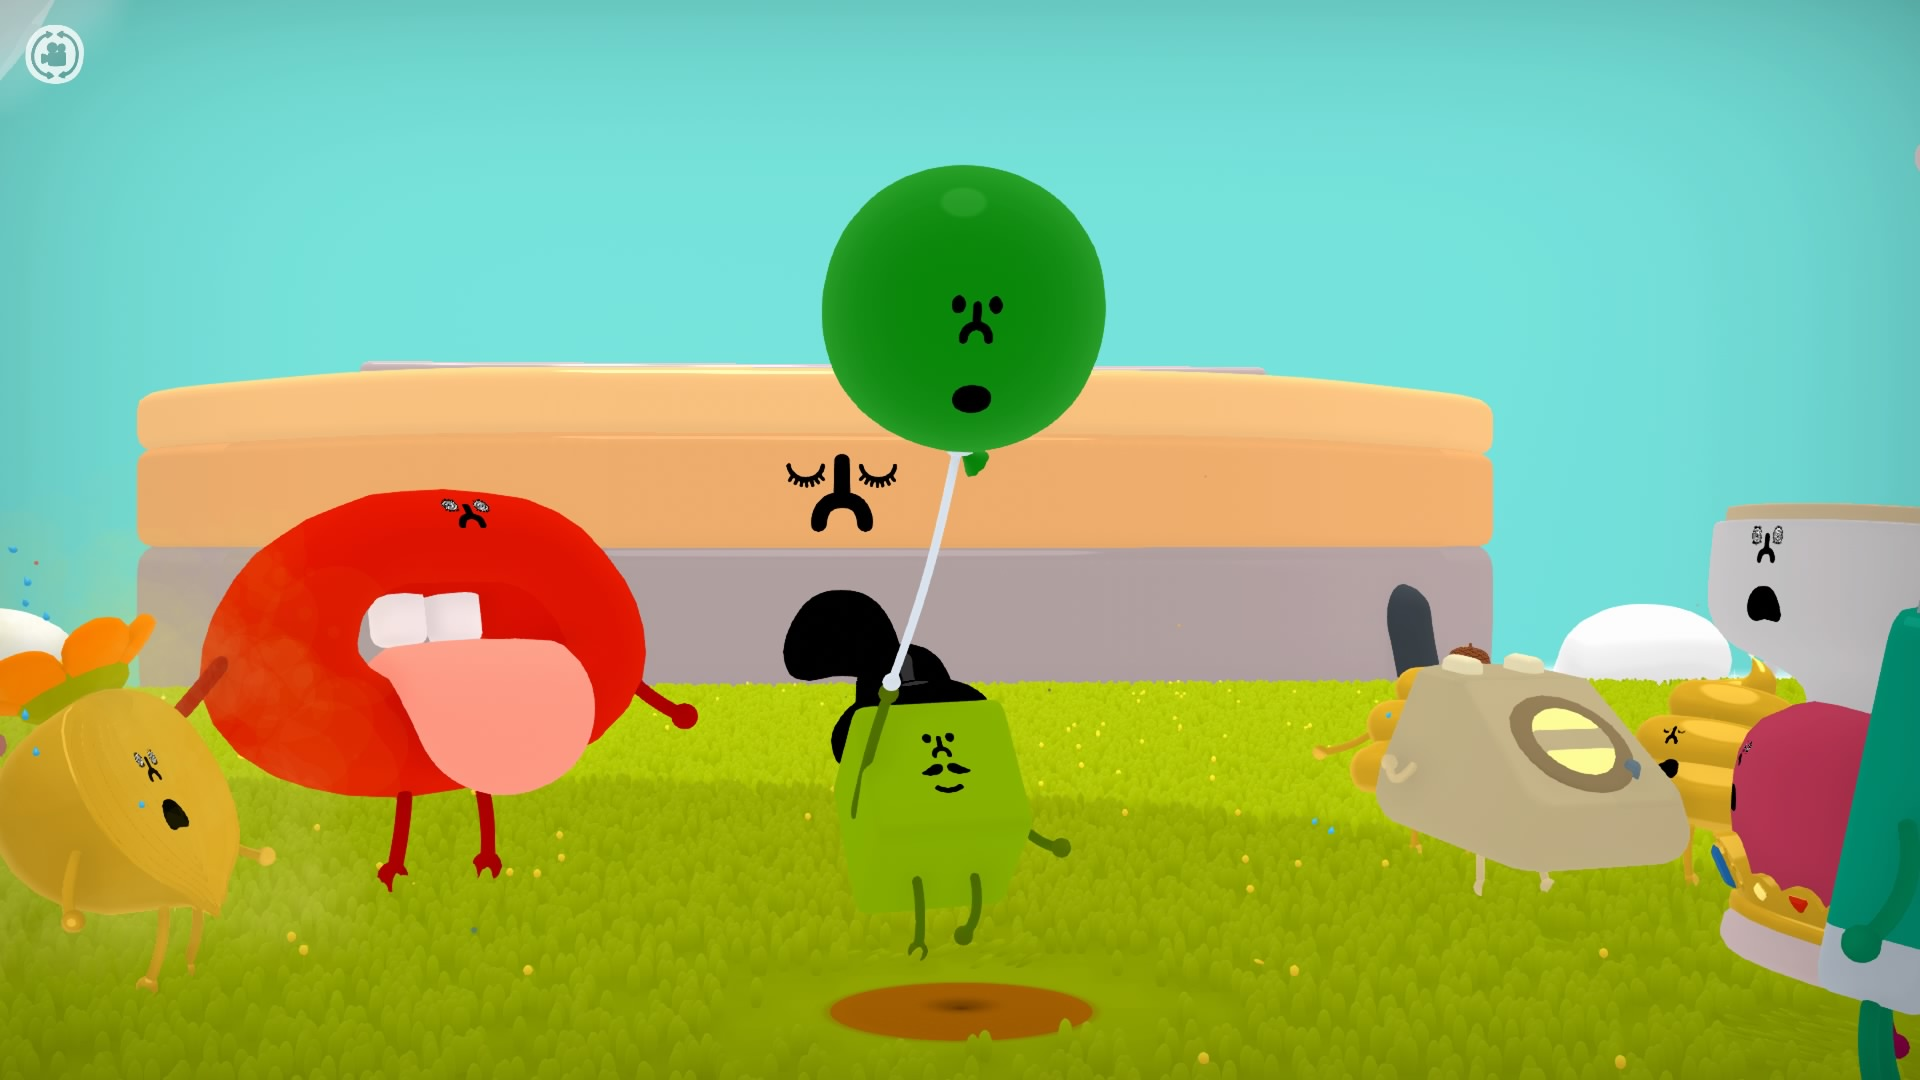 Animal Crossing Mayor Porn keita takahashi and the farce of virtual stuff | egm